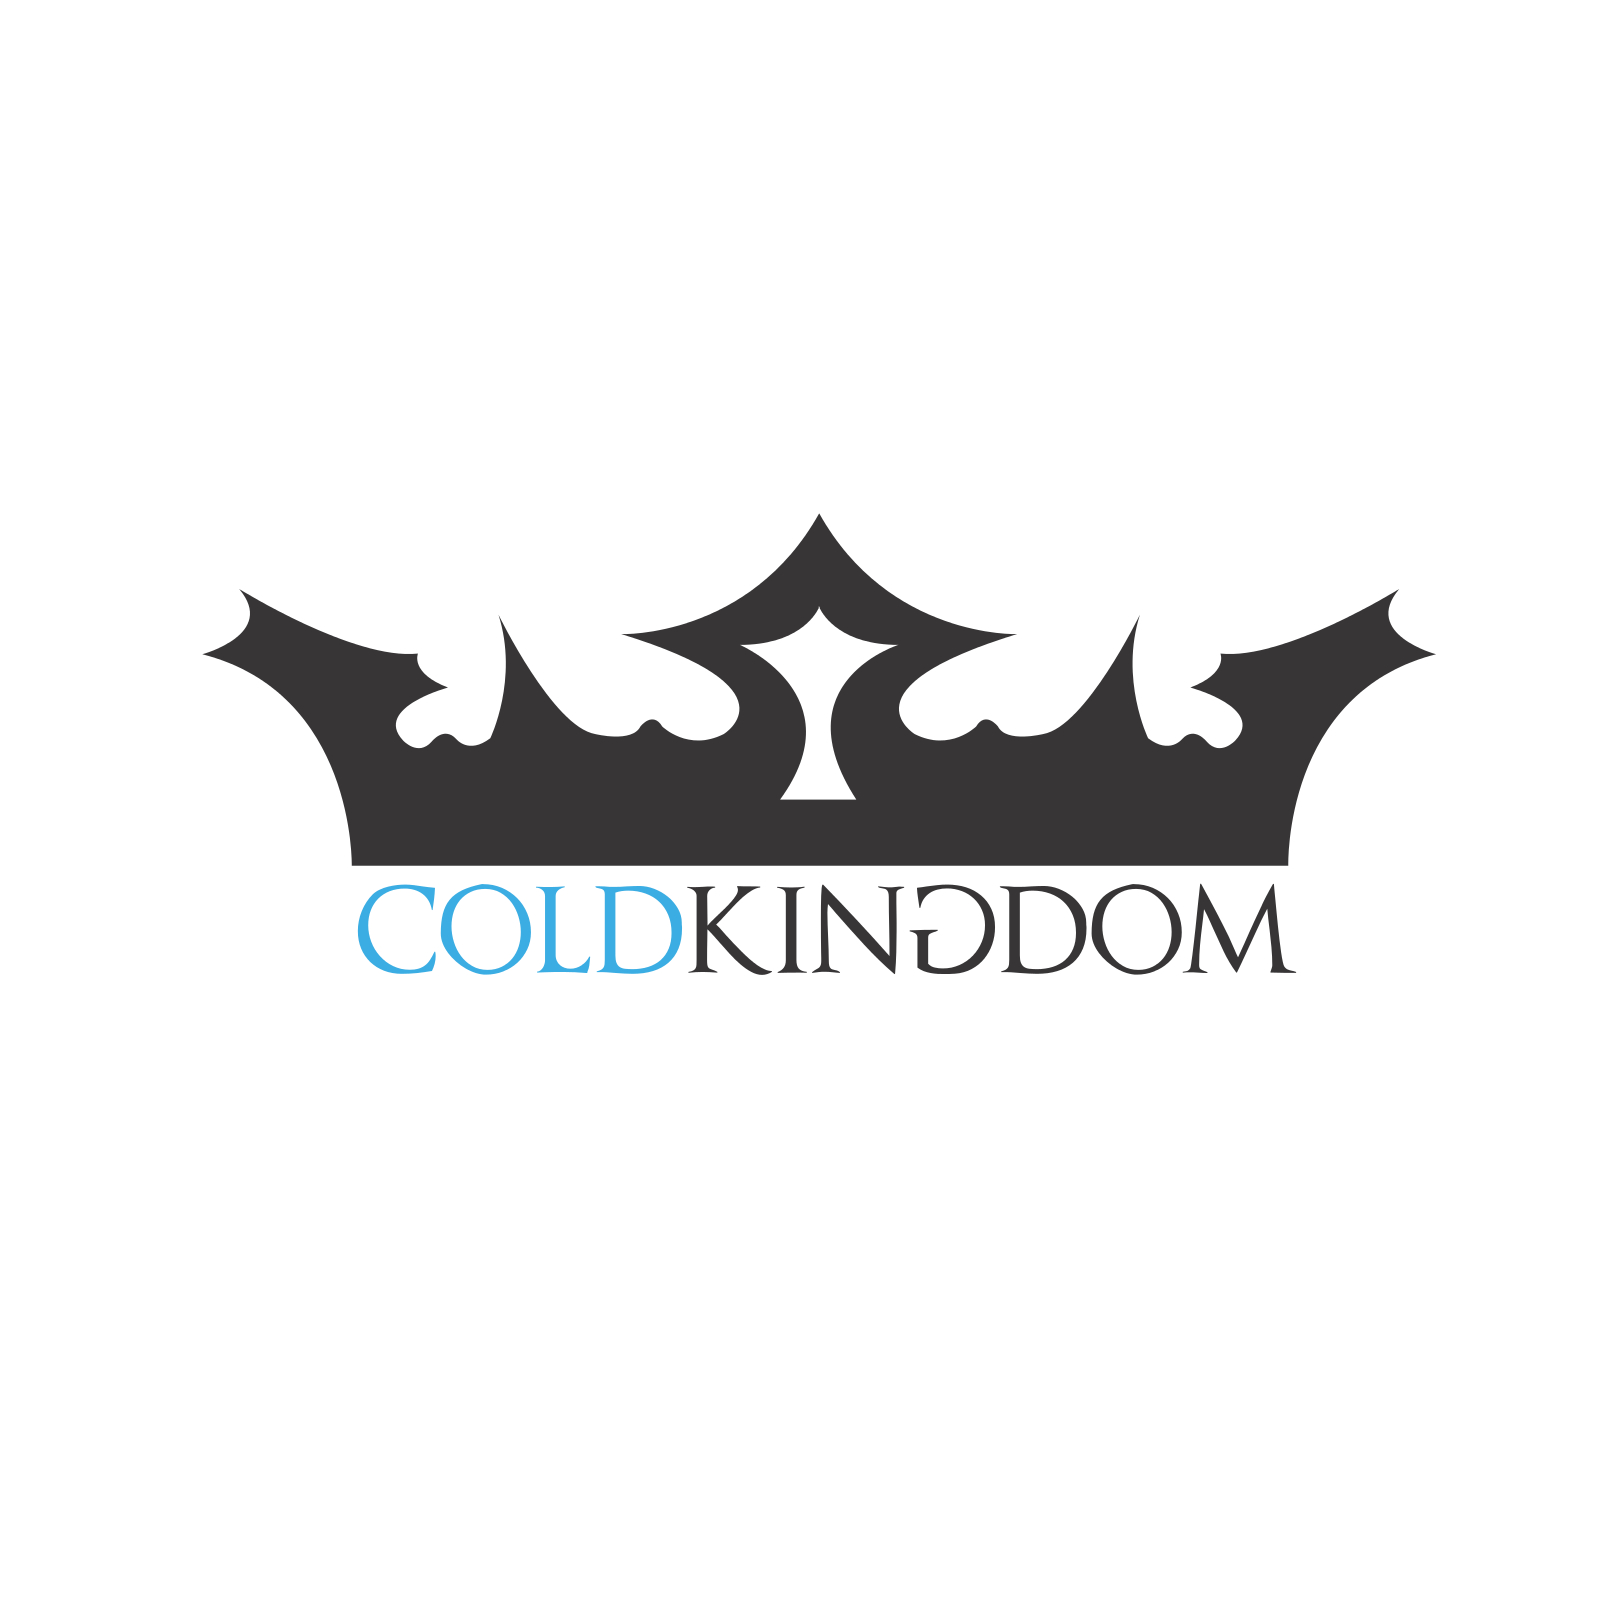 Cold Kingdom